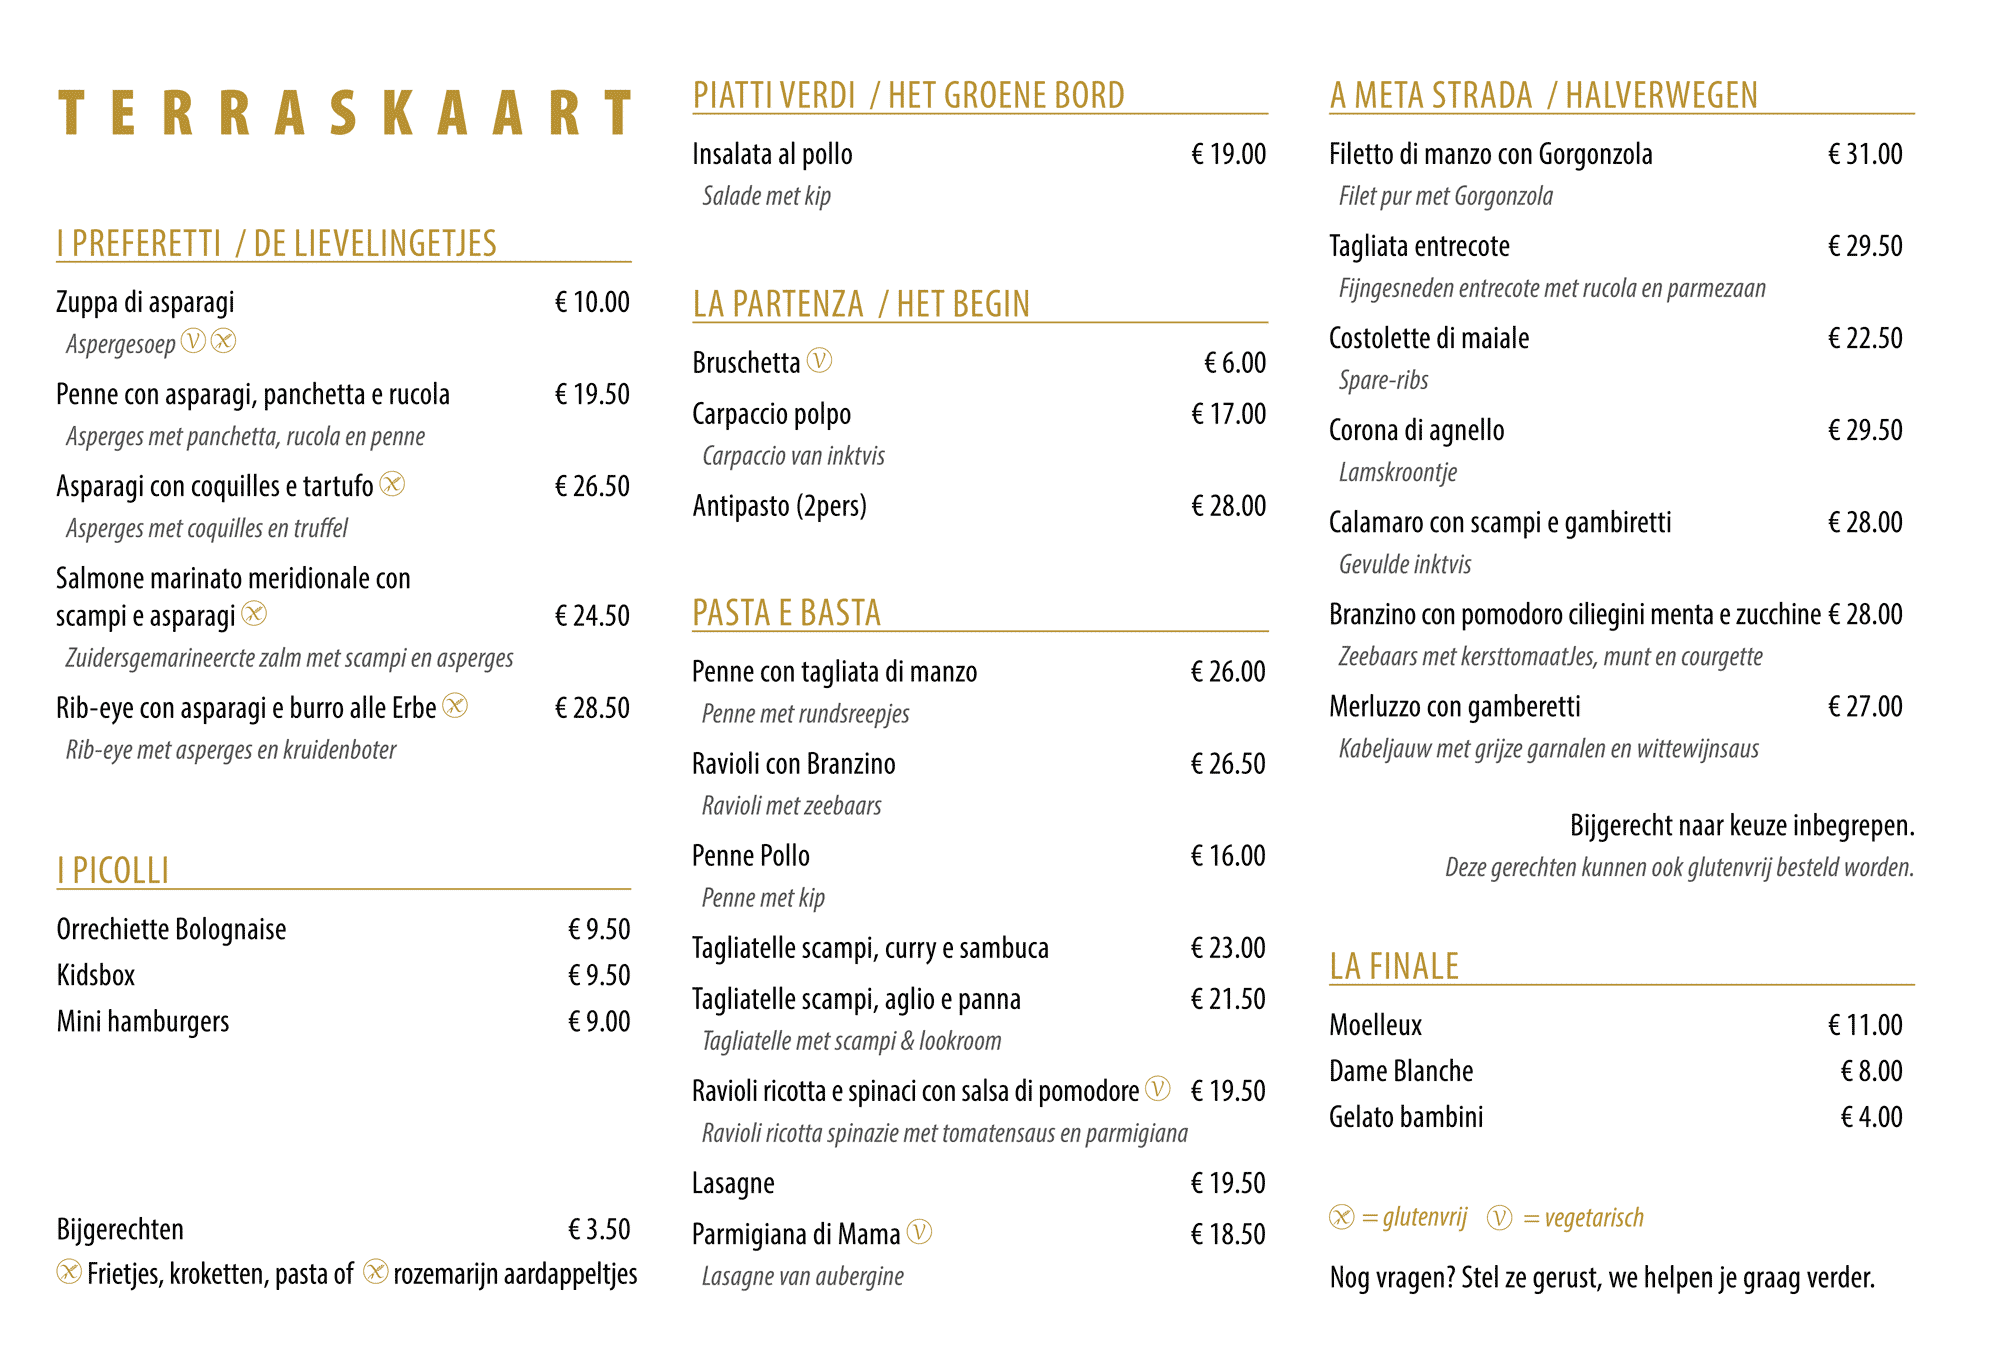 Brasserie Fratelli - Terras menu - Houthalen